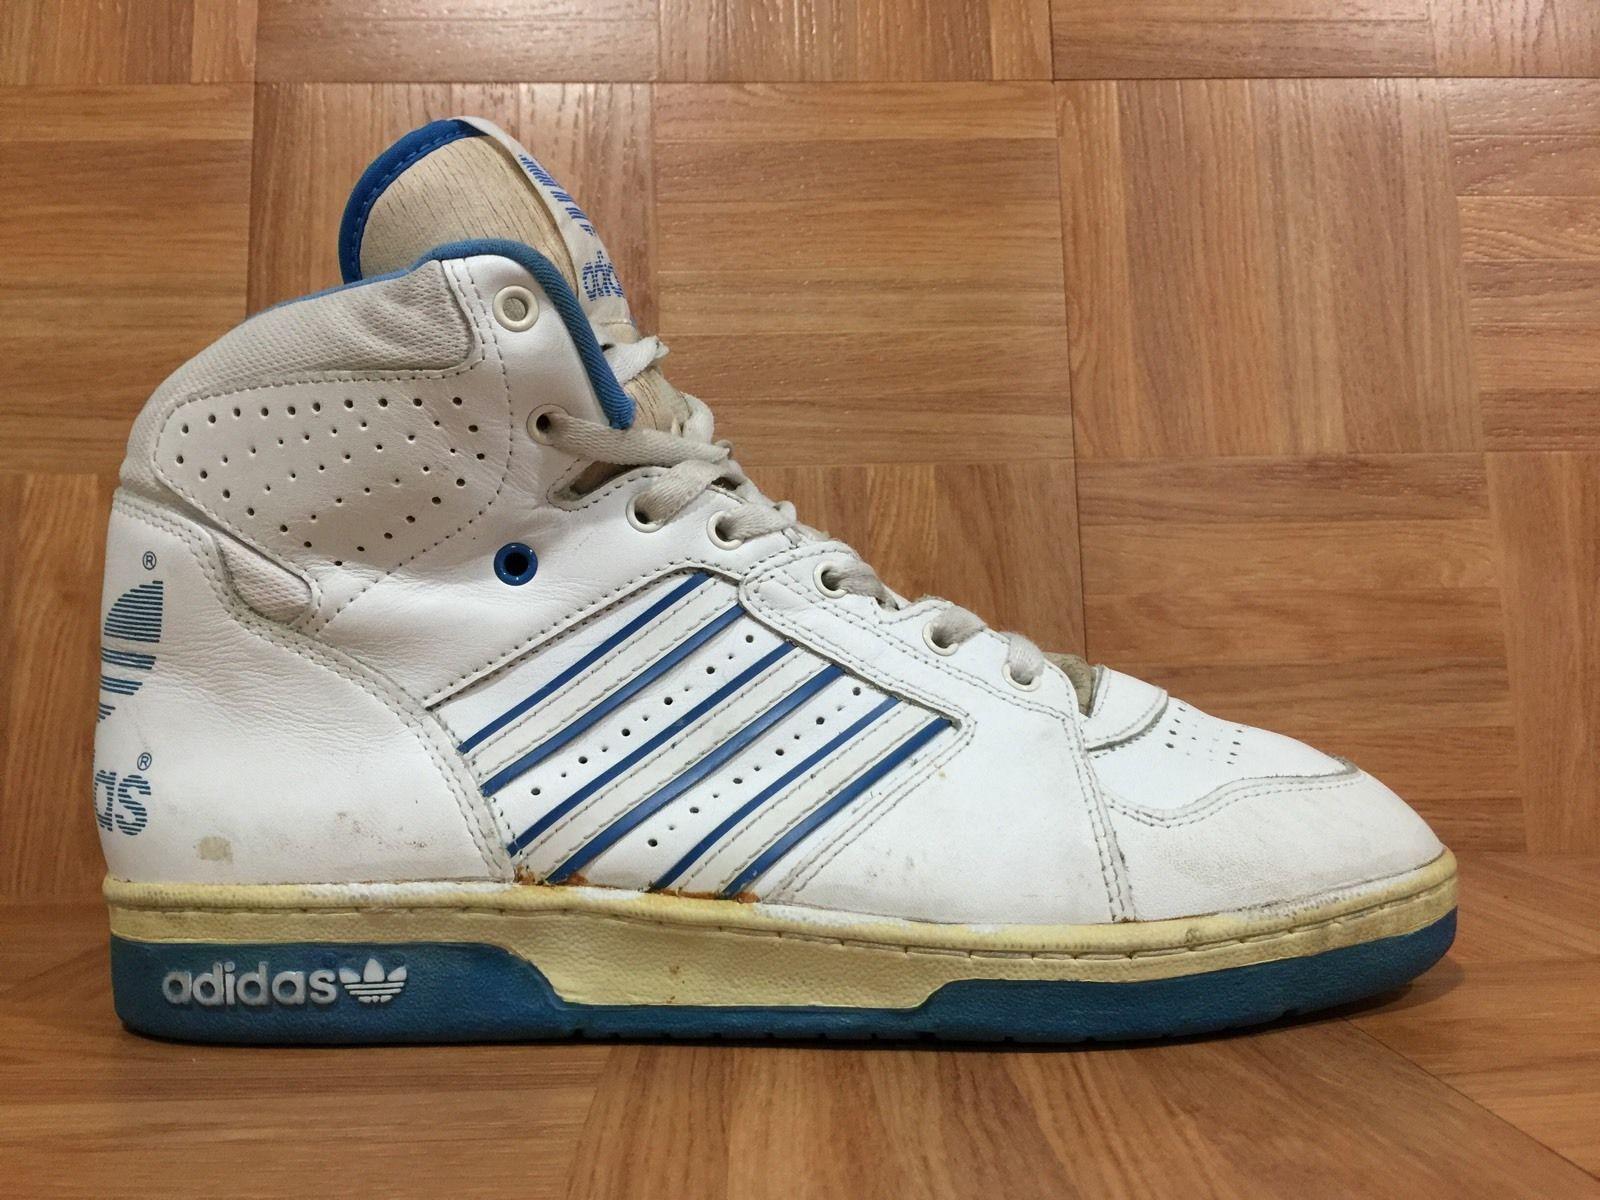 VTG   Adidas Instinct Sky Hi Retro Basketball Sneakers 80 s Sz 11 Men s  Vintage in Clothing 0be7cb3429